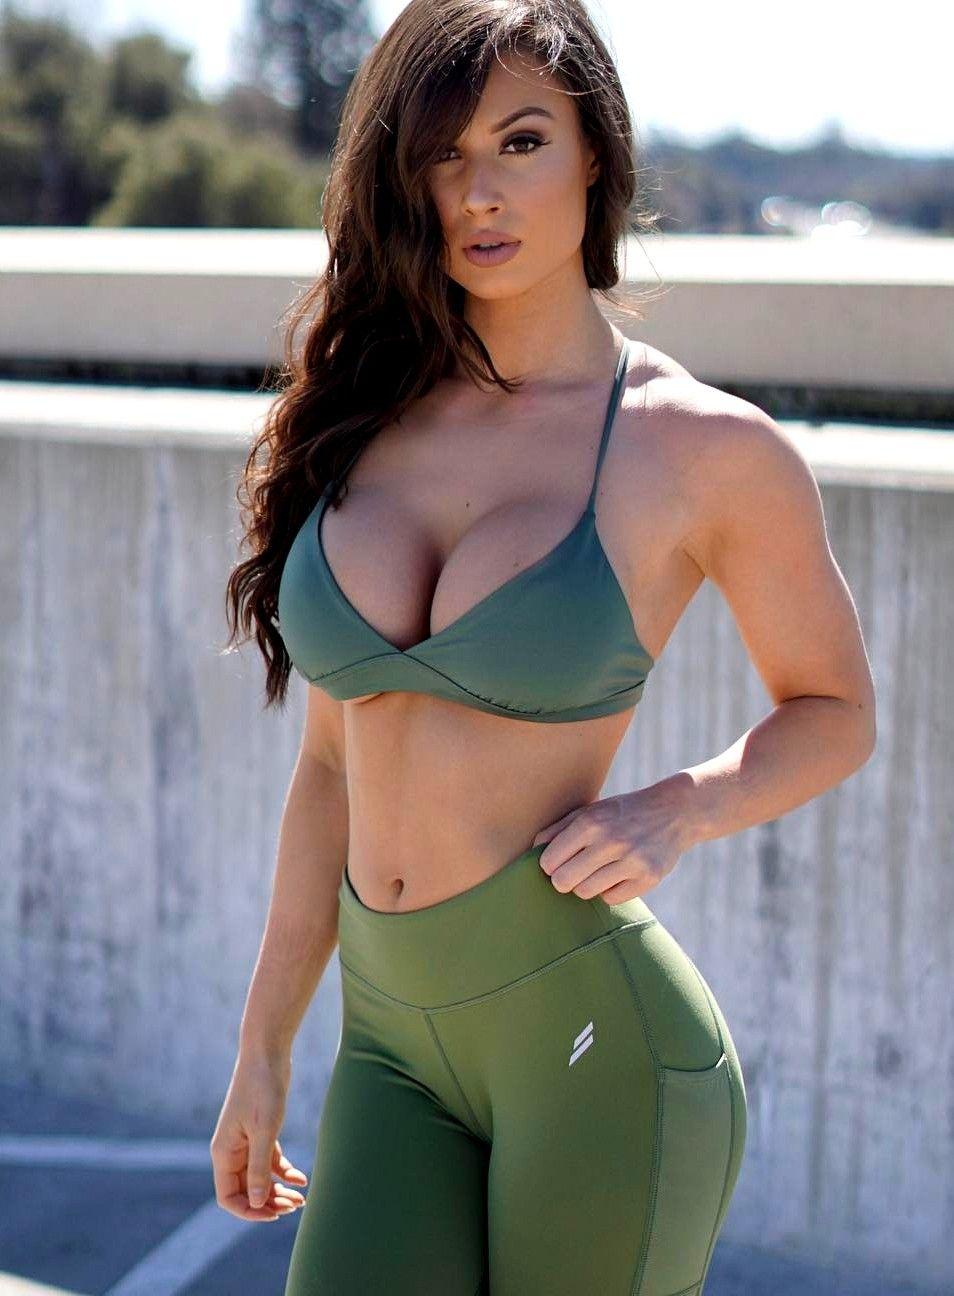 Bianca Kmiec Bianca Kmiec t Fitness modeling Models